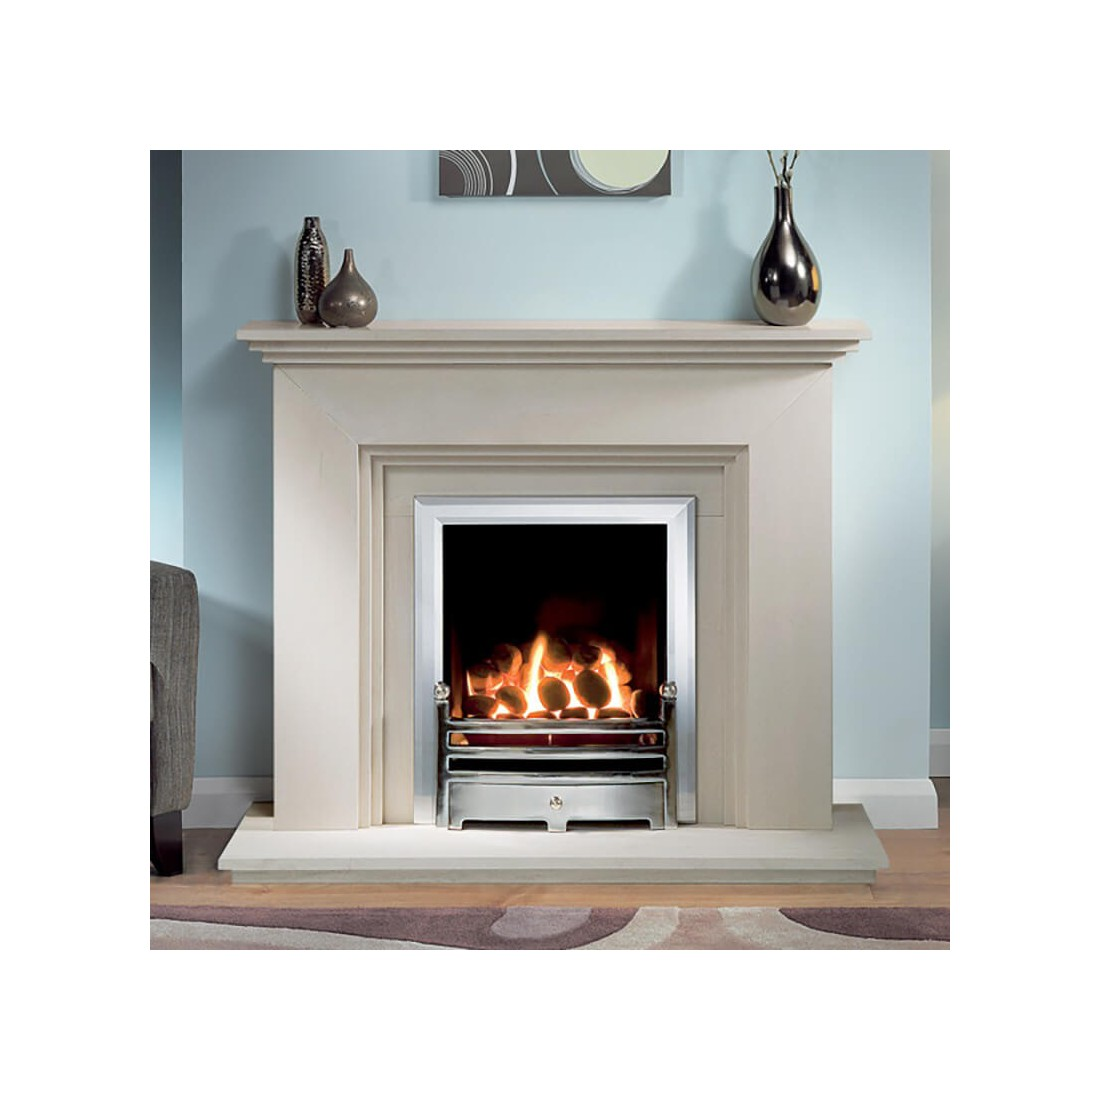 Cranbourne Portuguese Limestone Fireplace In Stock Fireland Co Uk